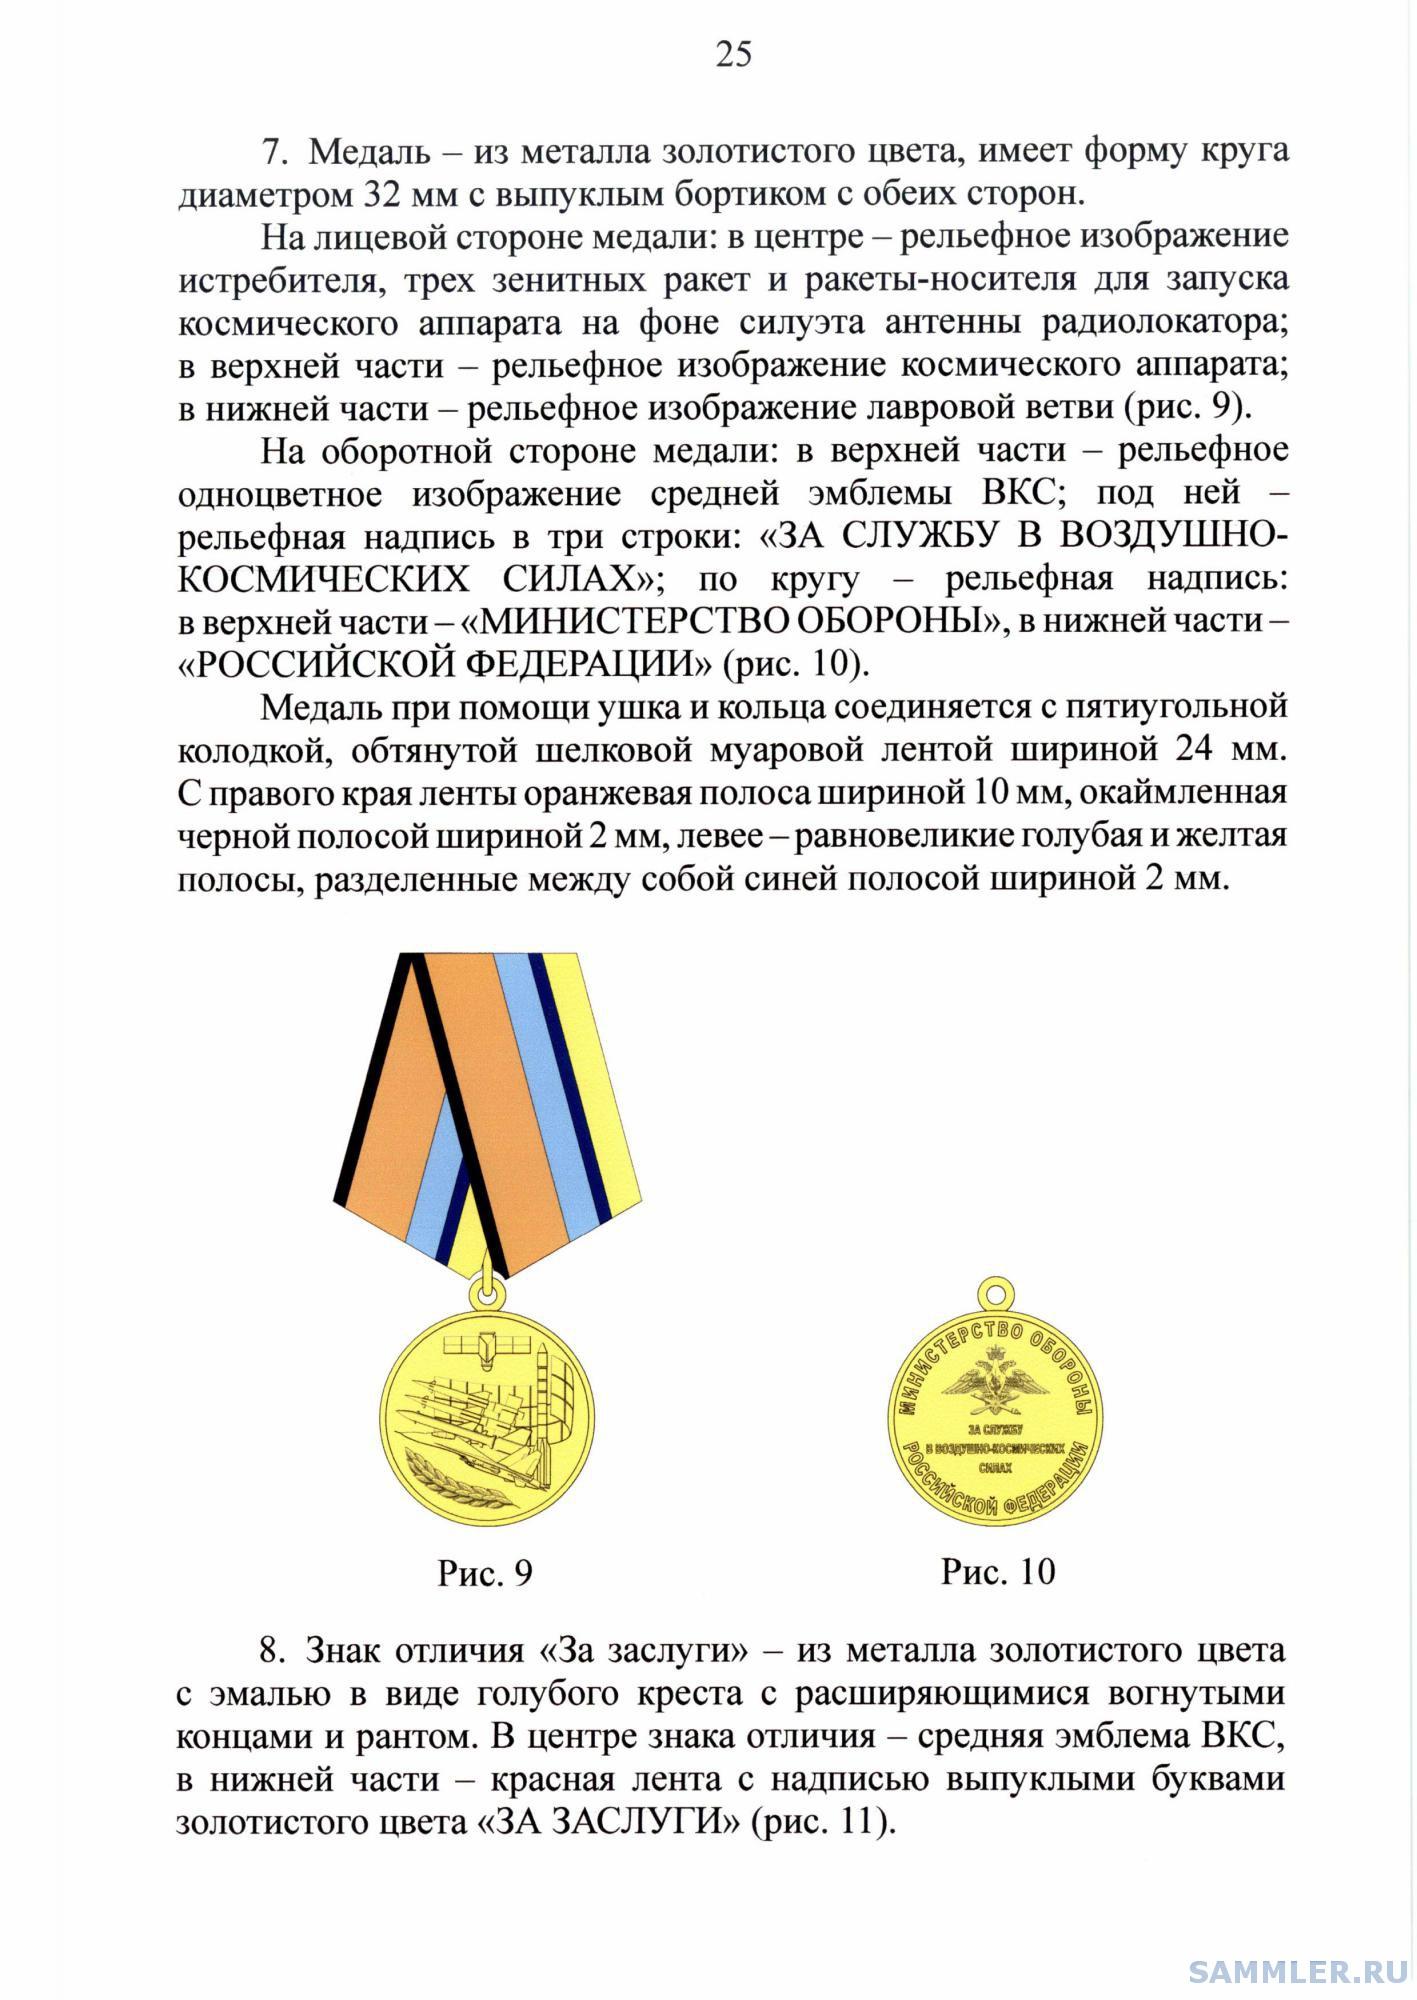 МО РФ 470(цвет)-25.jpg